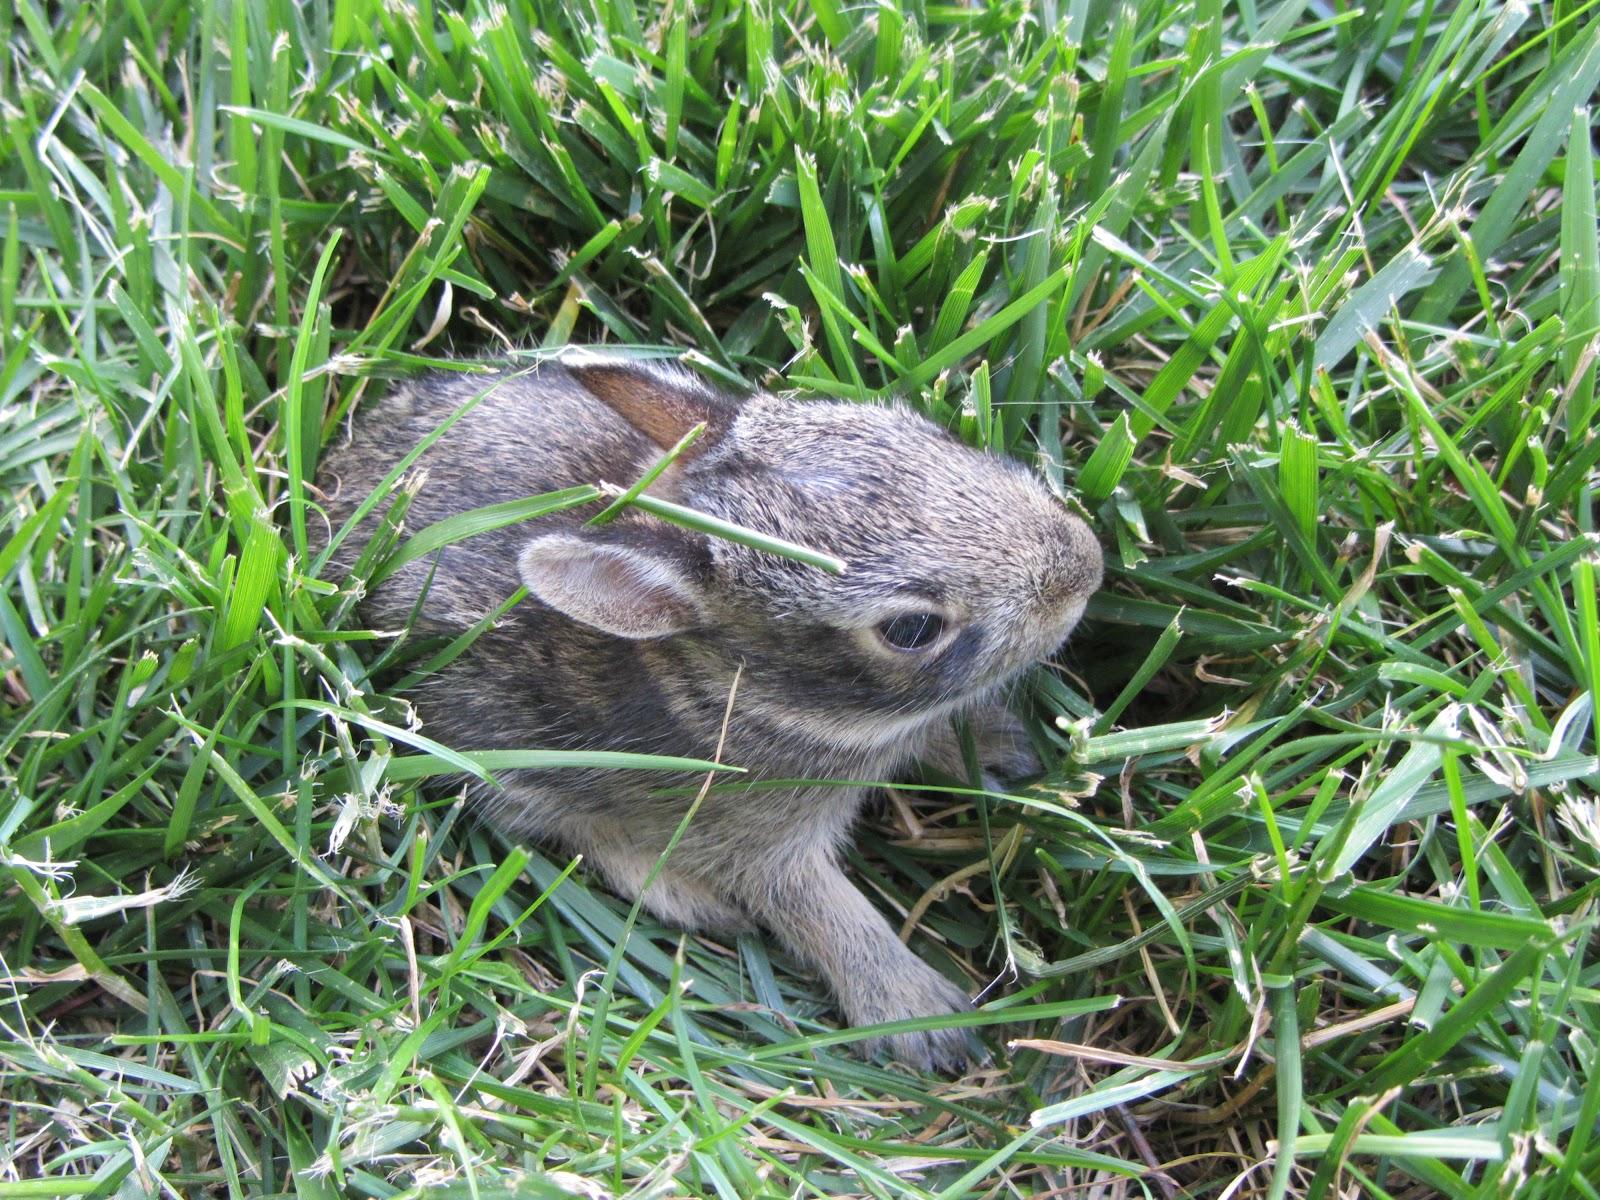 Paper Cut Screams by Cheryl: Baby Bunnies In My Backyard